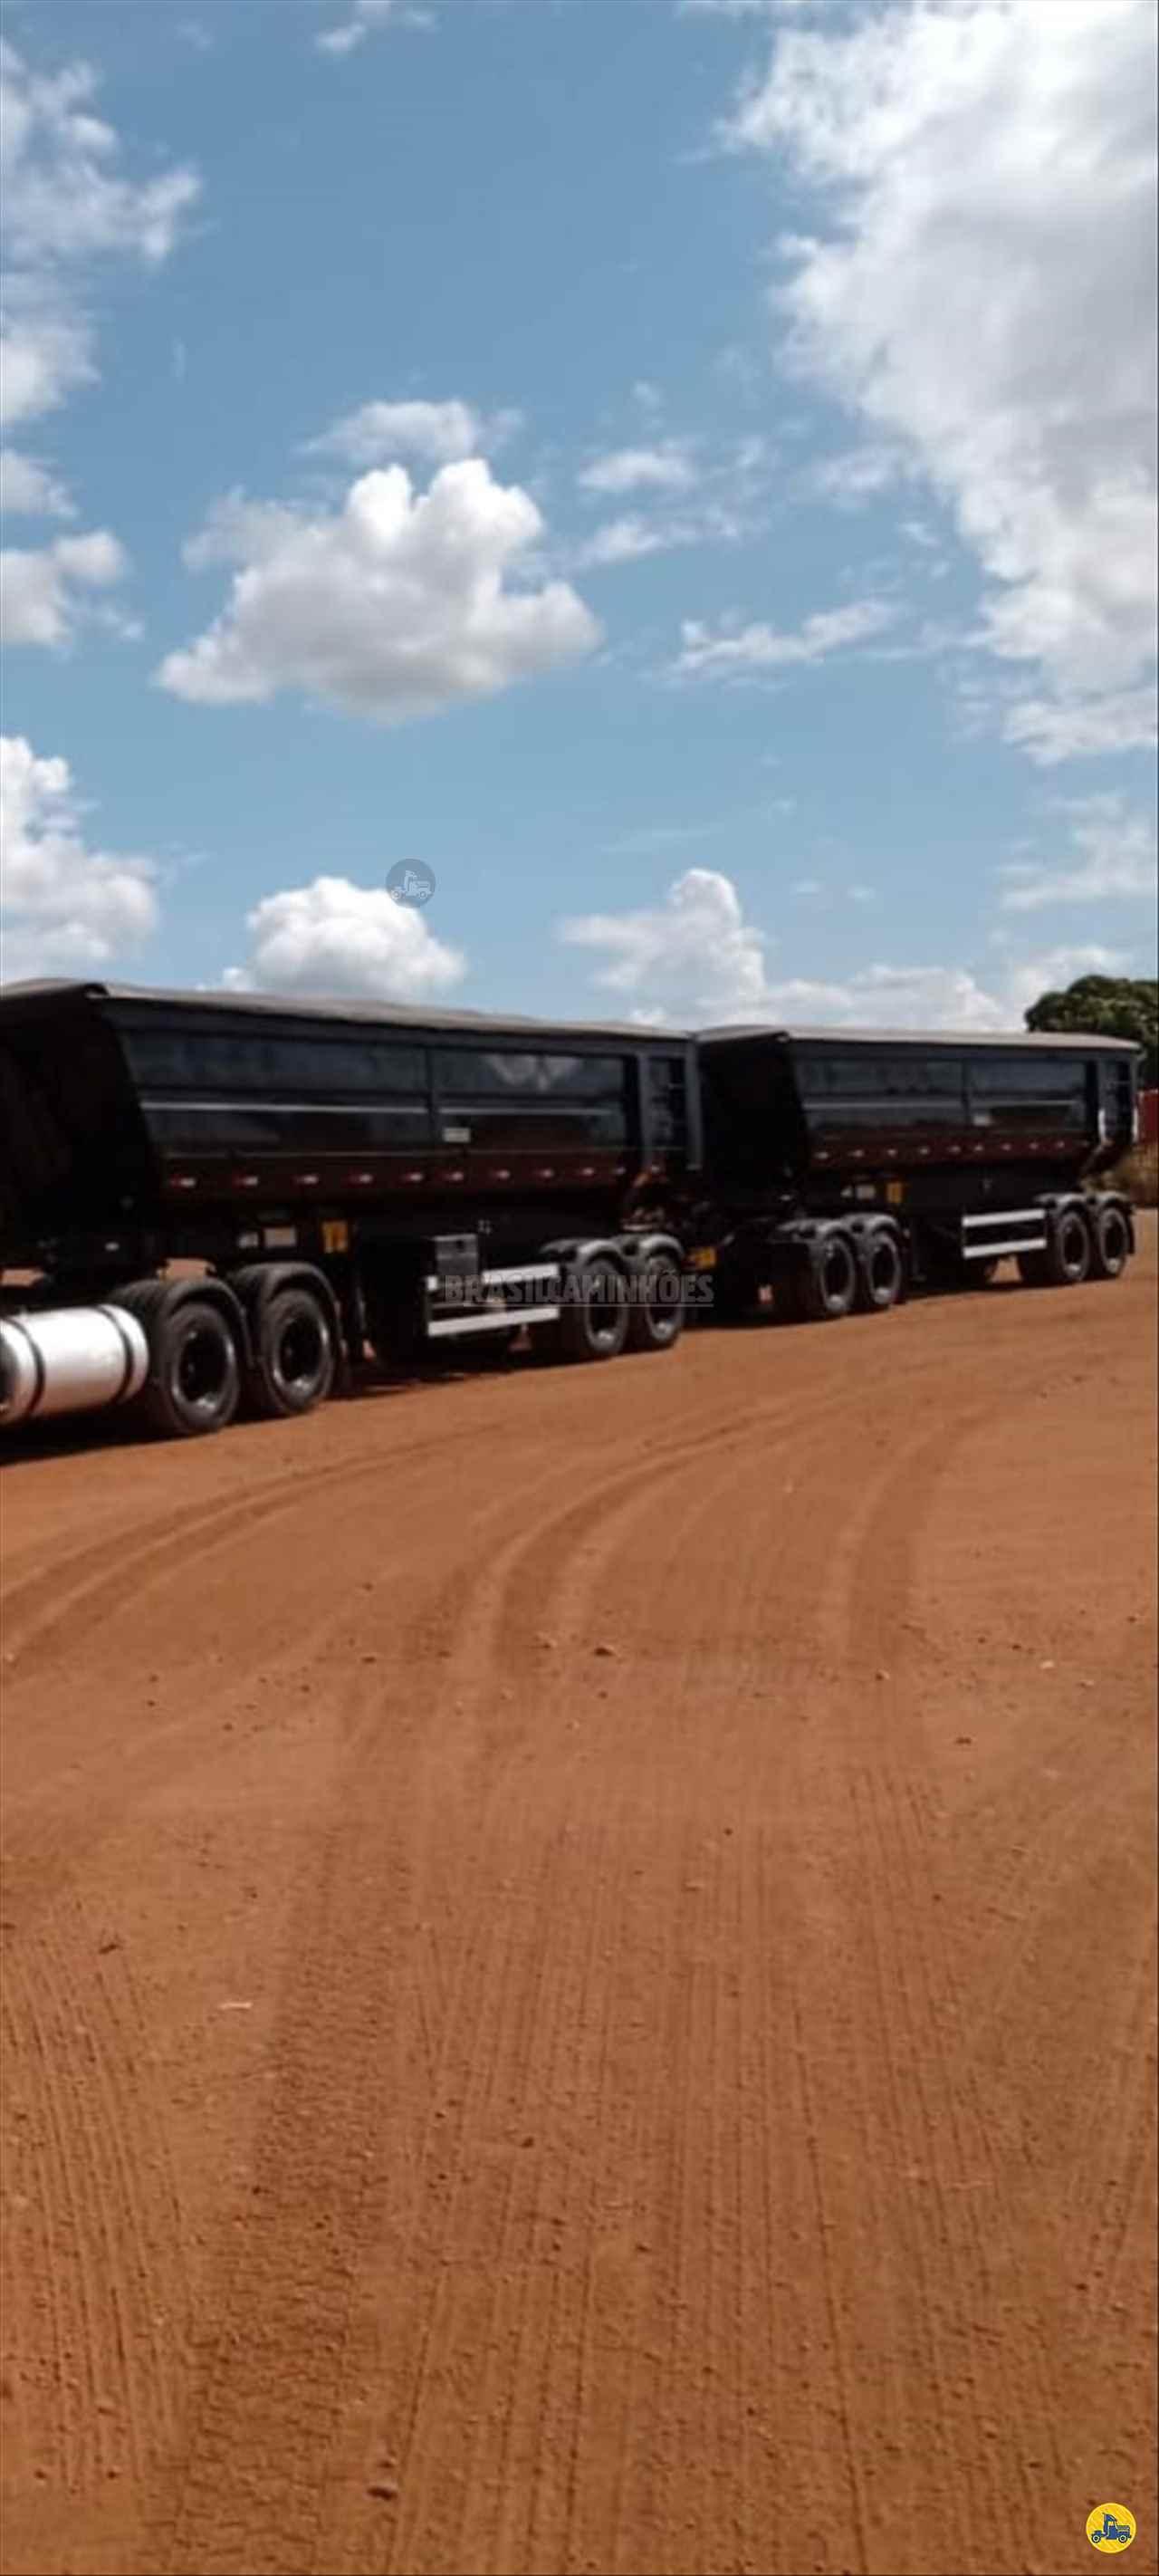 CARRETA RODOTREM BASCULANTE Brasil Caminhões Sinop SINOP MATO GROSSO MT